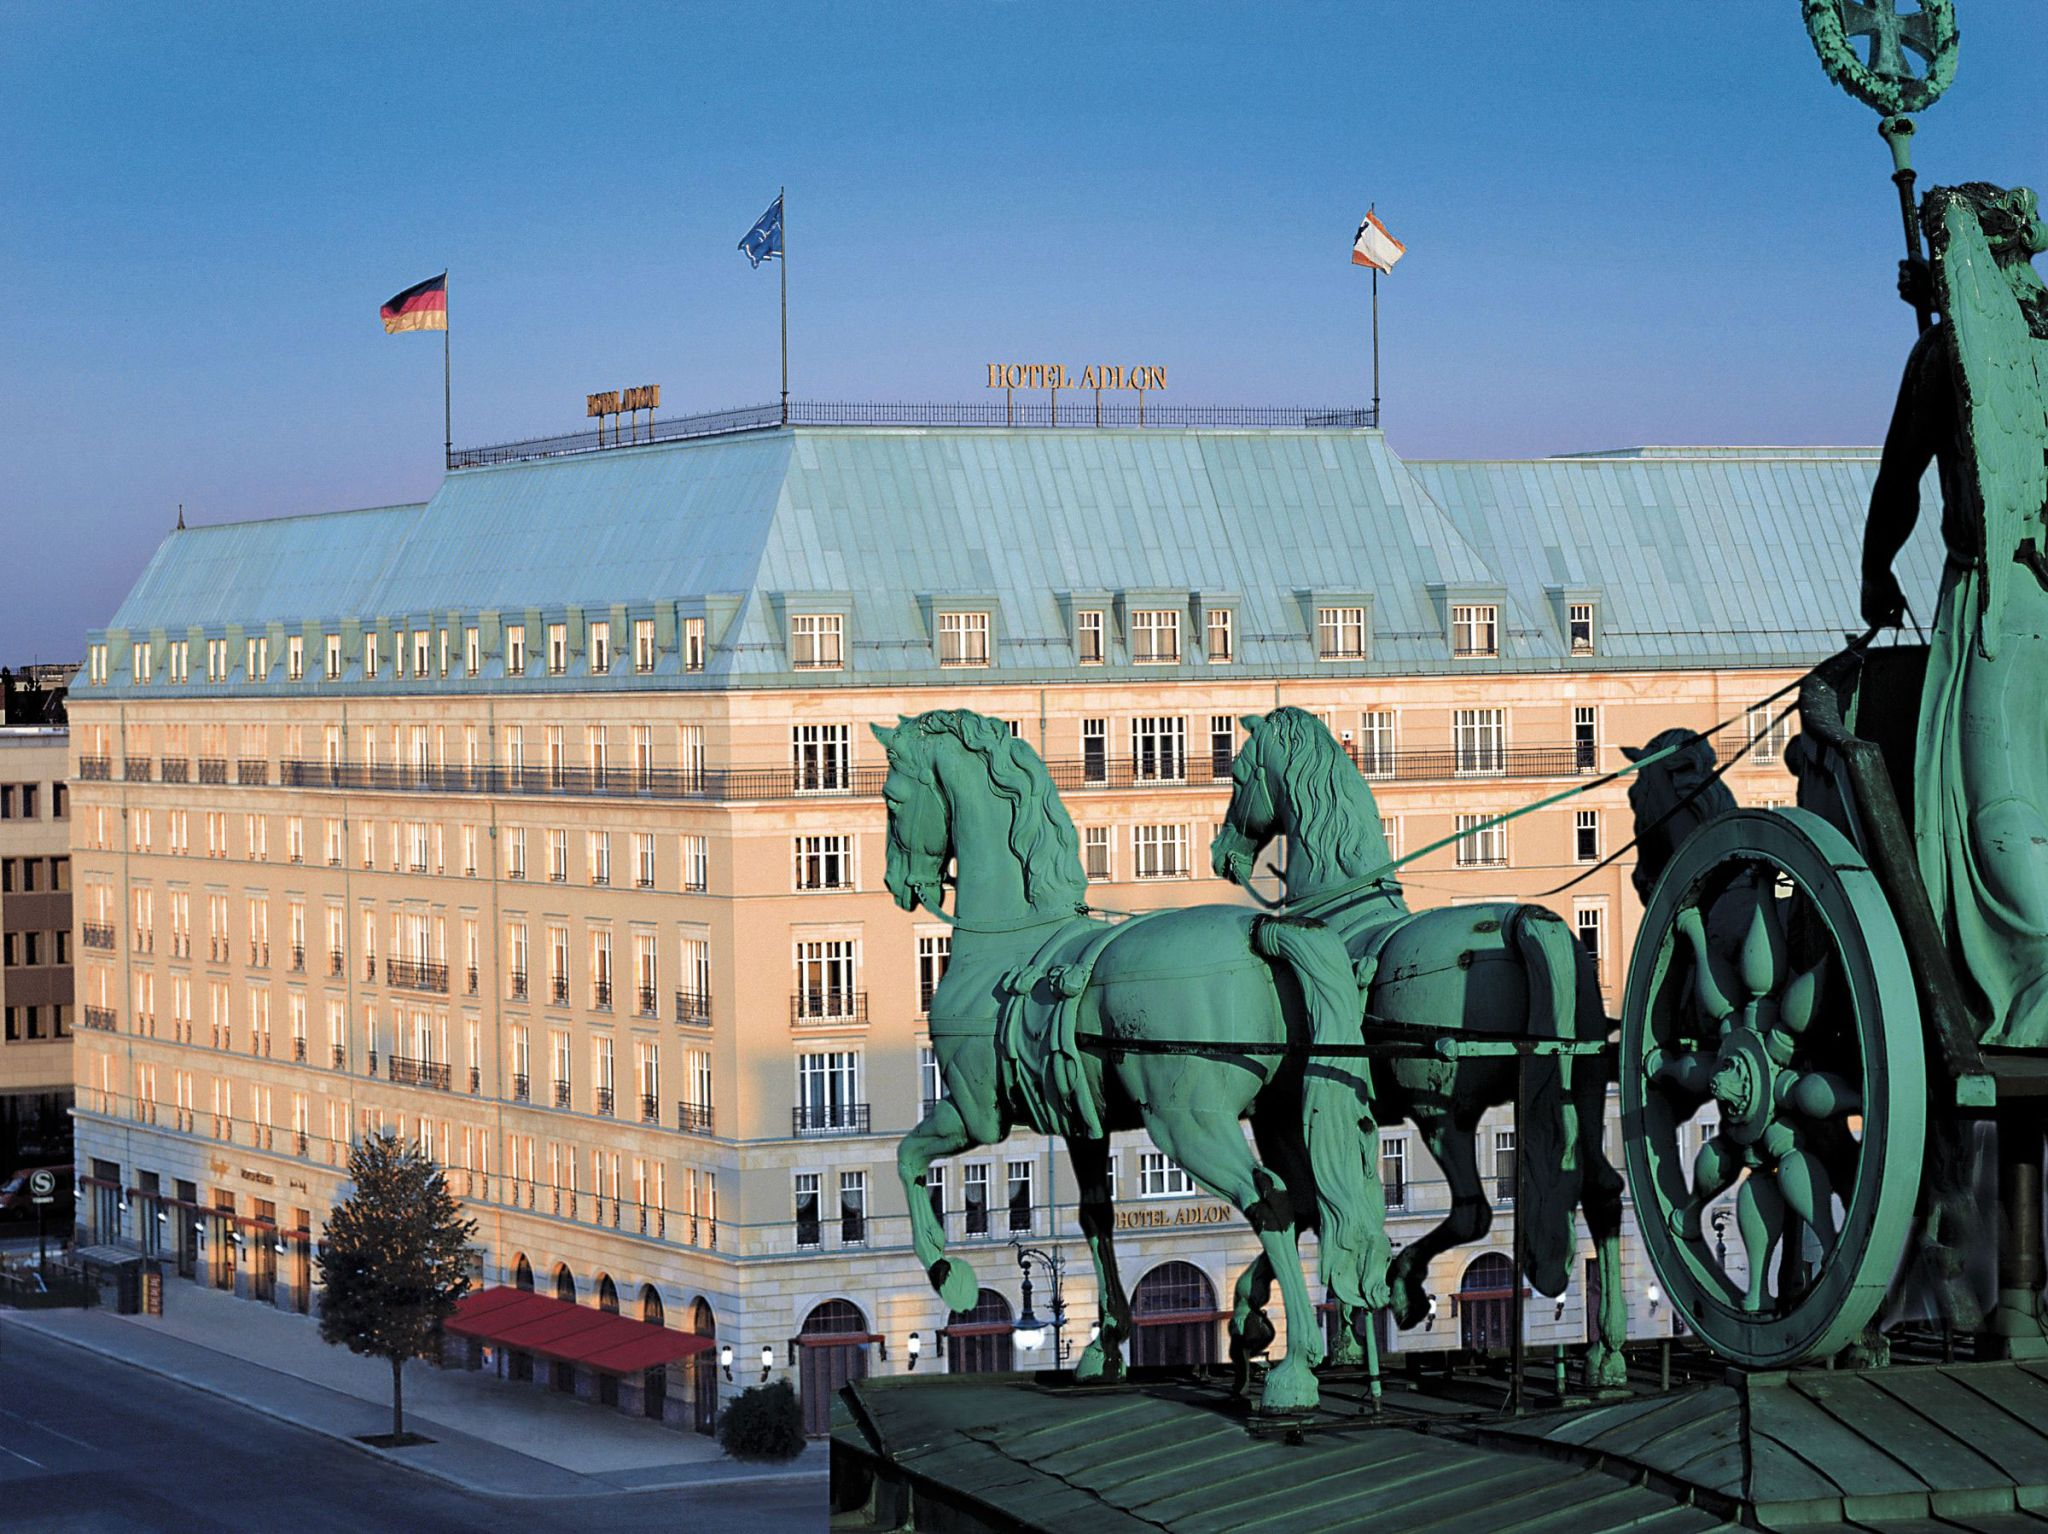 Hotel-Adlon-Exterior_1890_Original